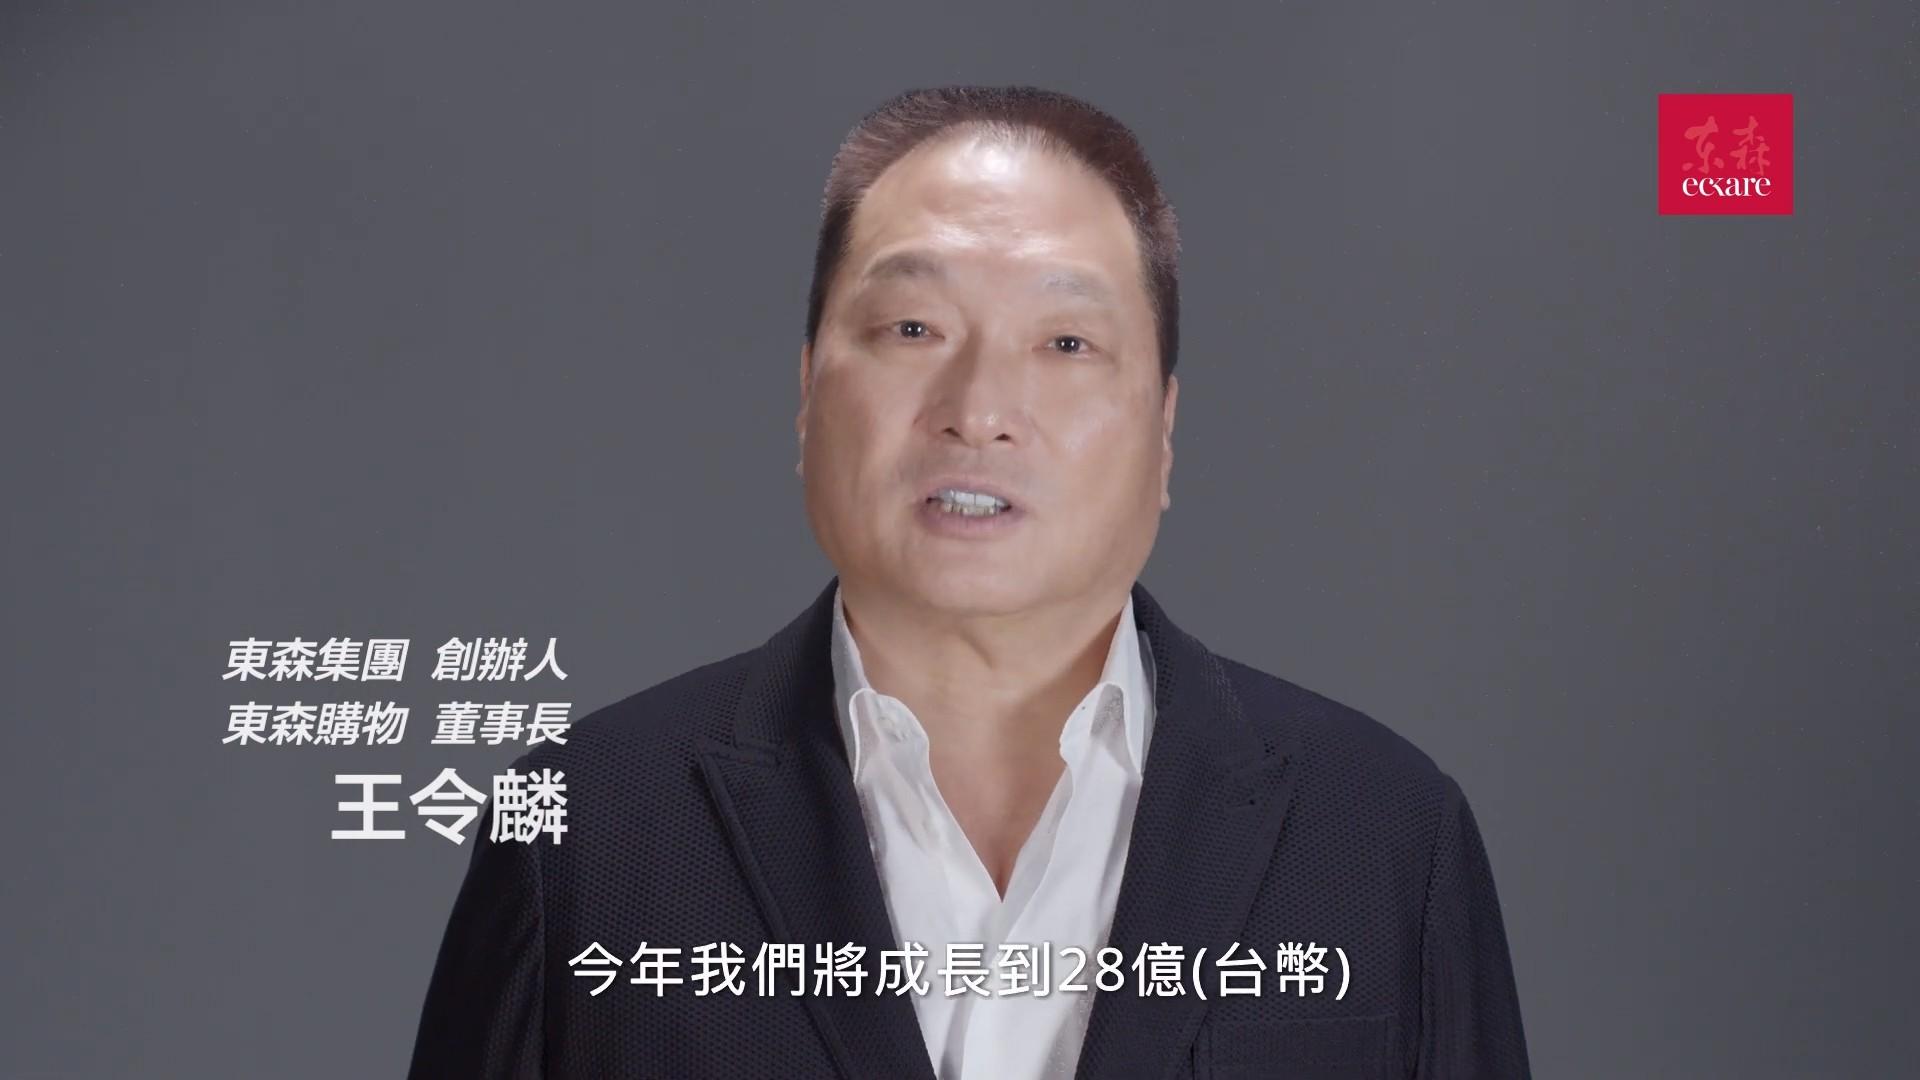 eckare東森全球新連鎖事業正式在香港啟動